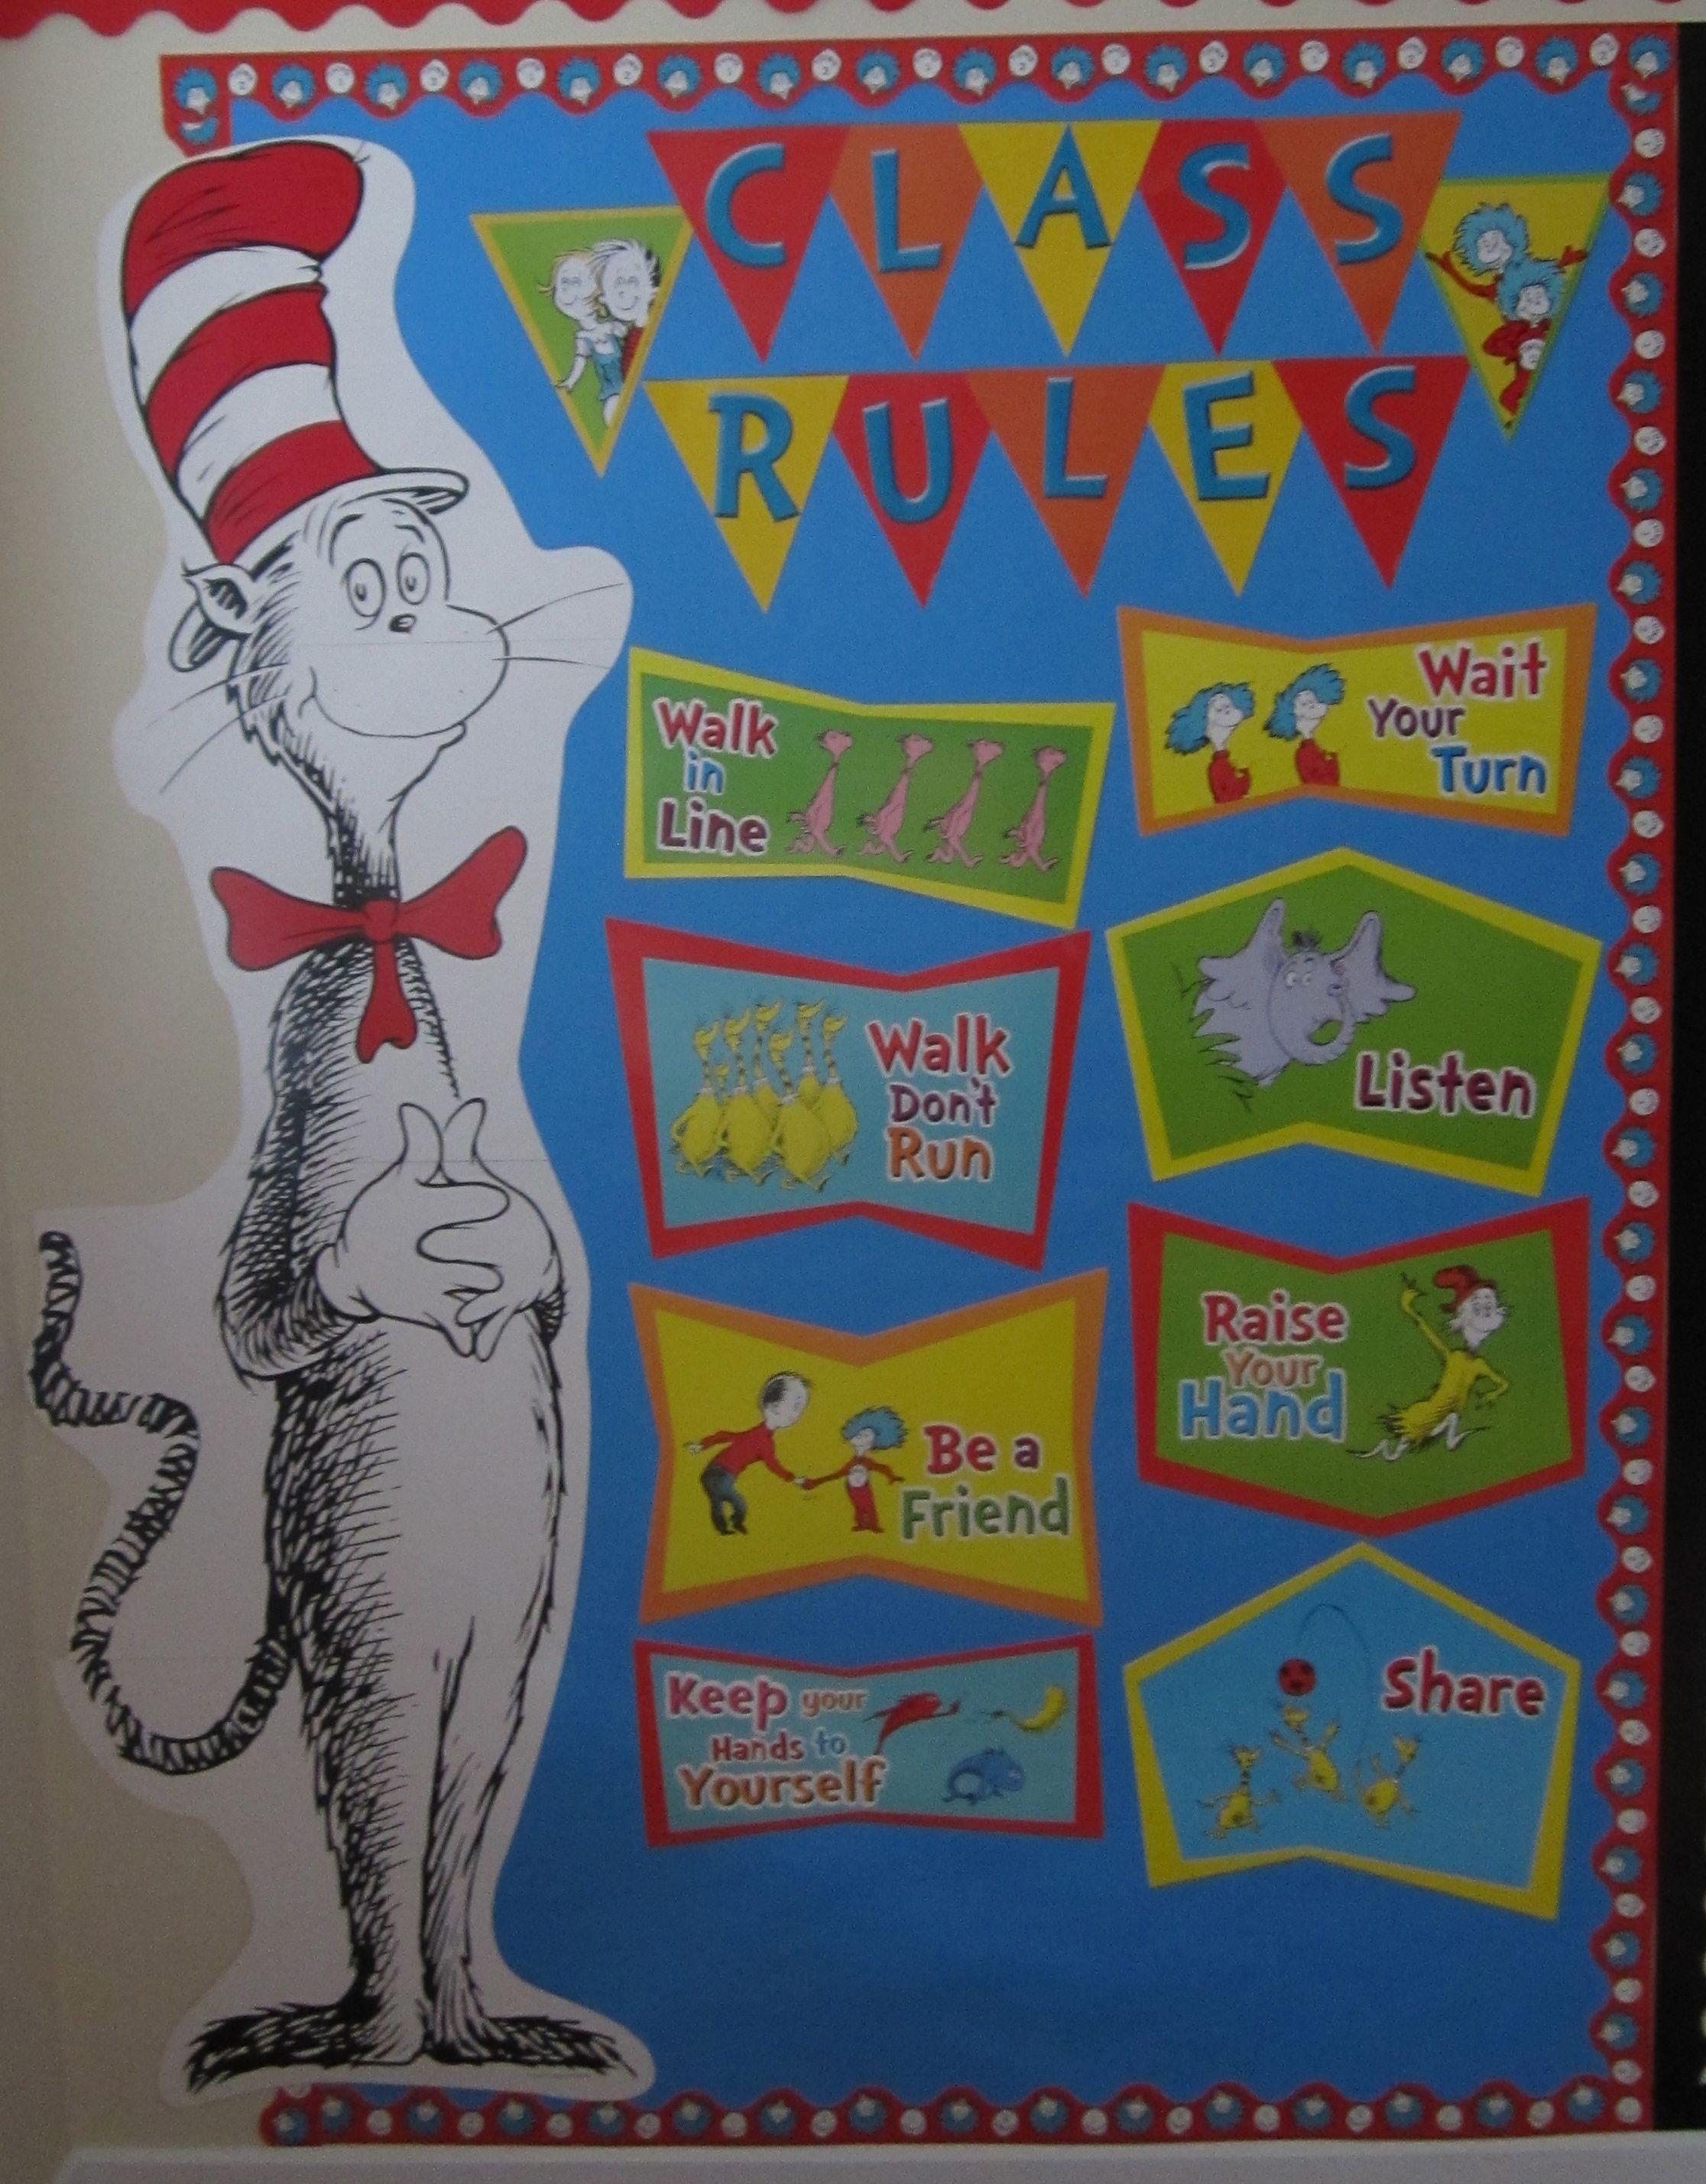 Dr Seuss Class Rules Eureka Cat In The Hat Bulletin